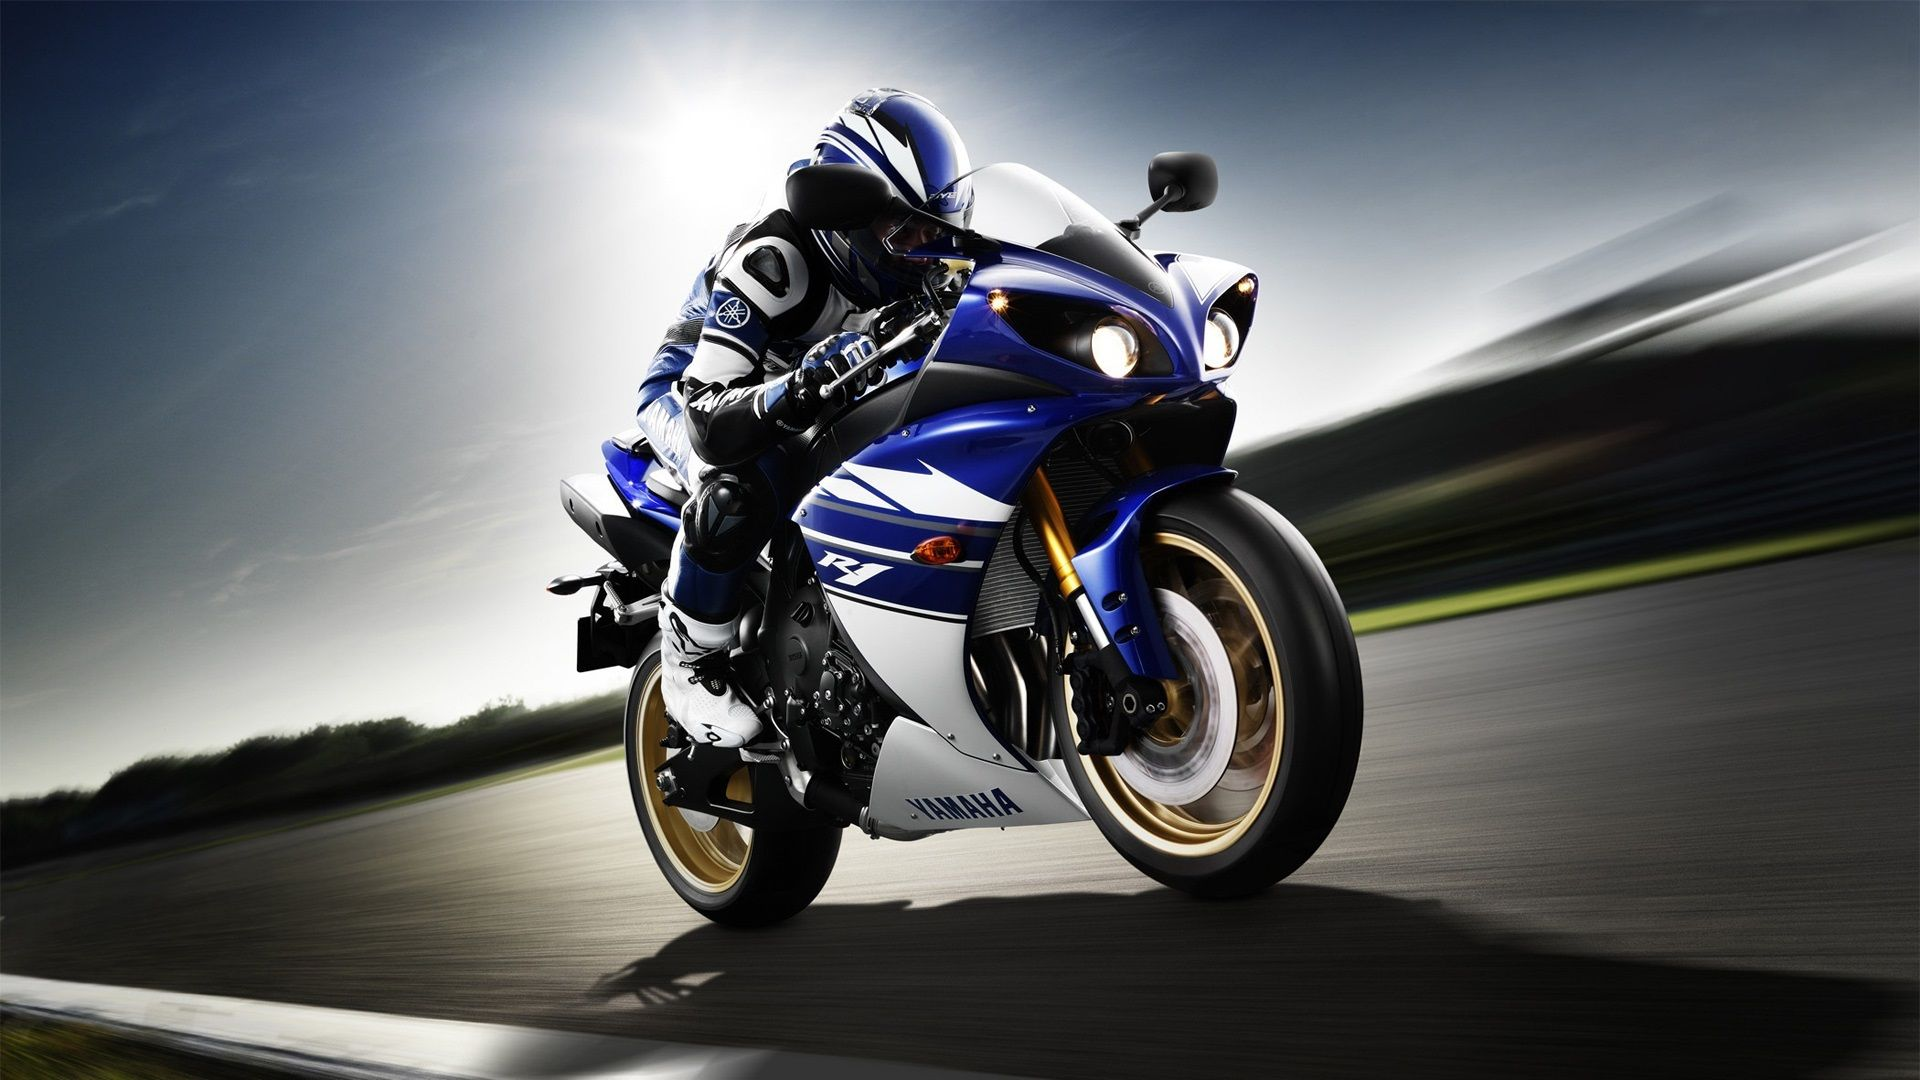 big motorcycles wallpapers - photo #45